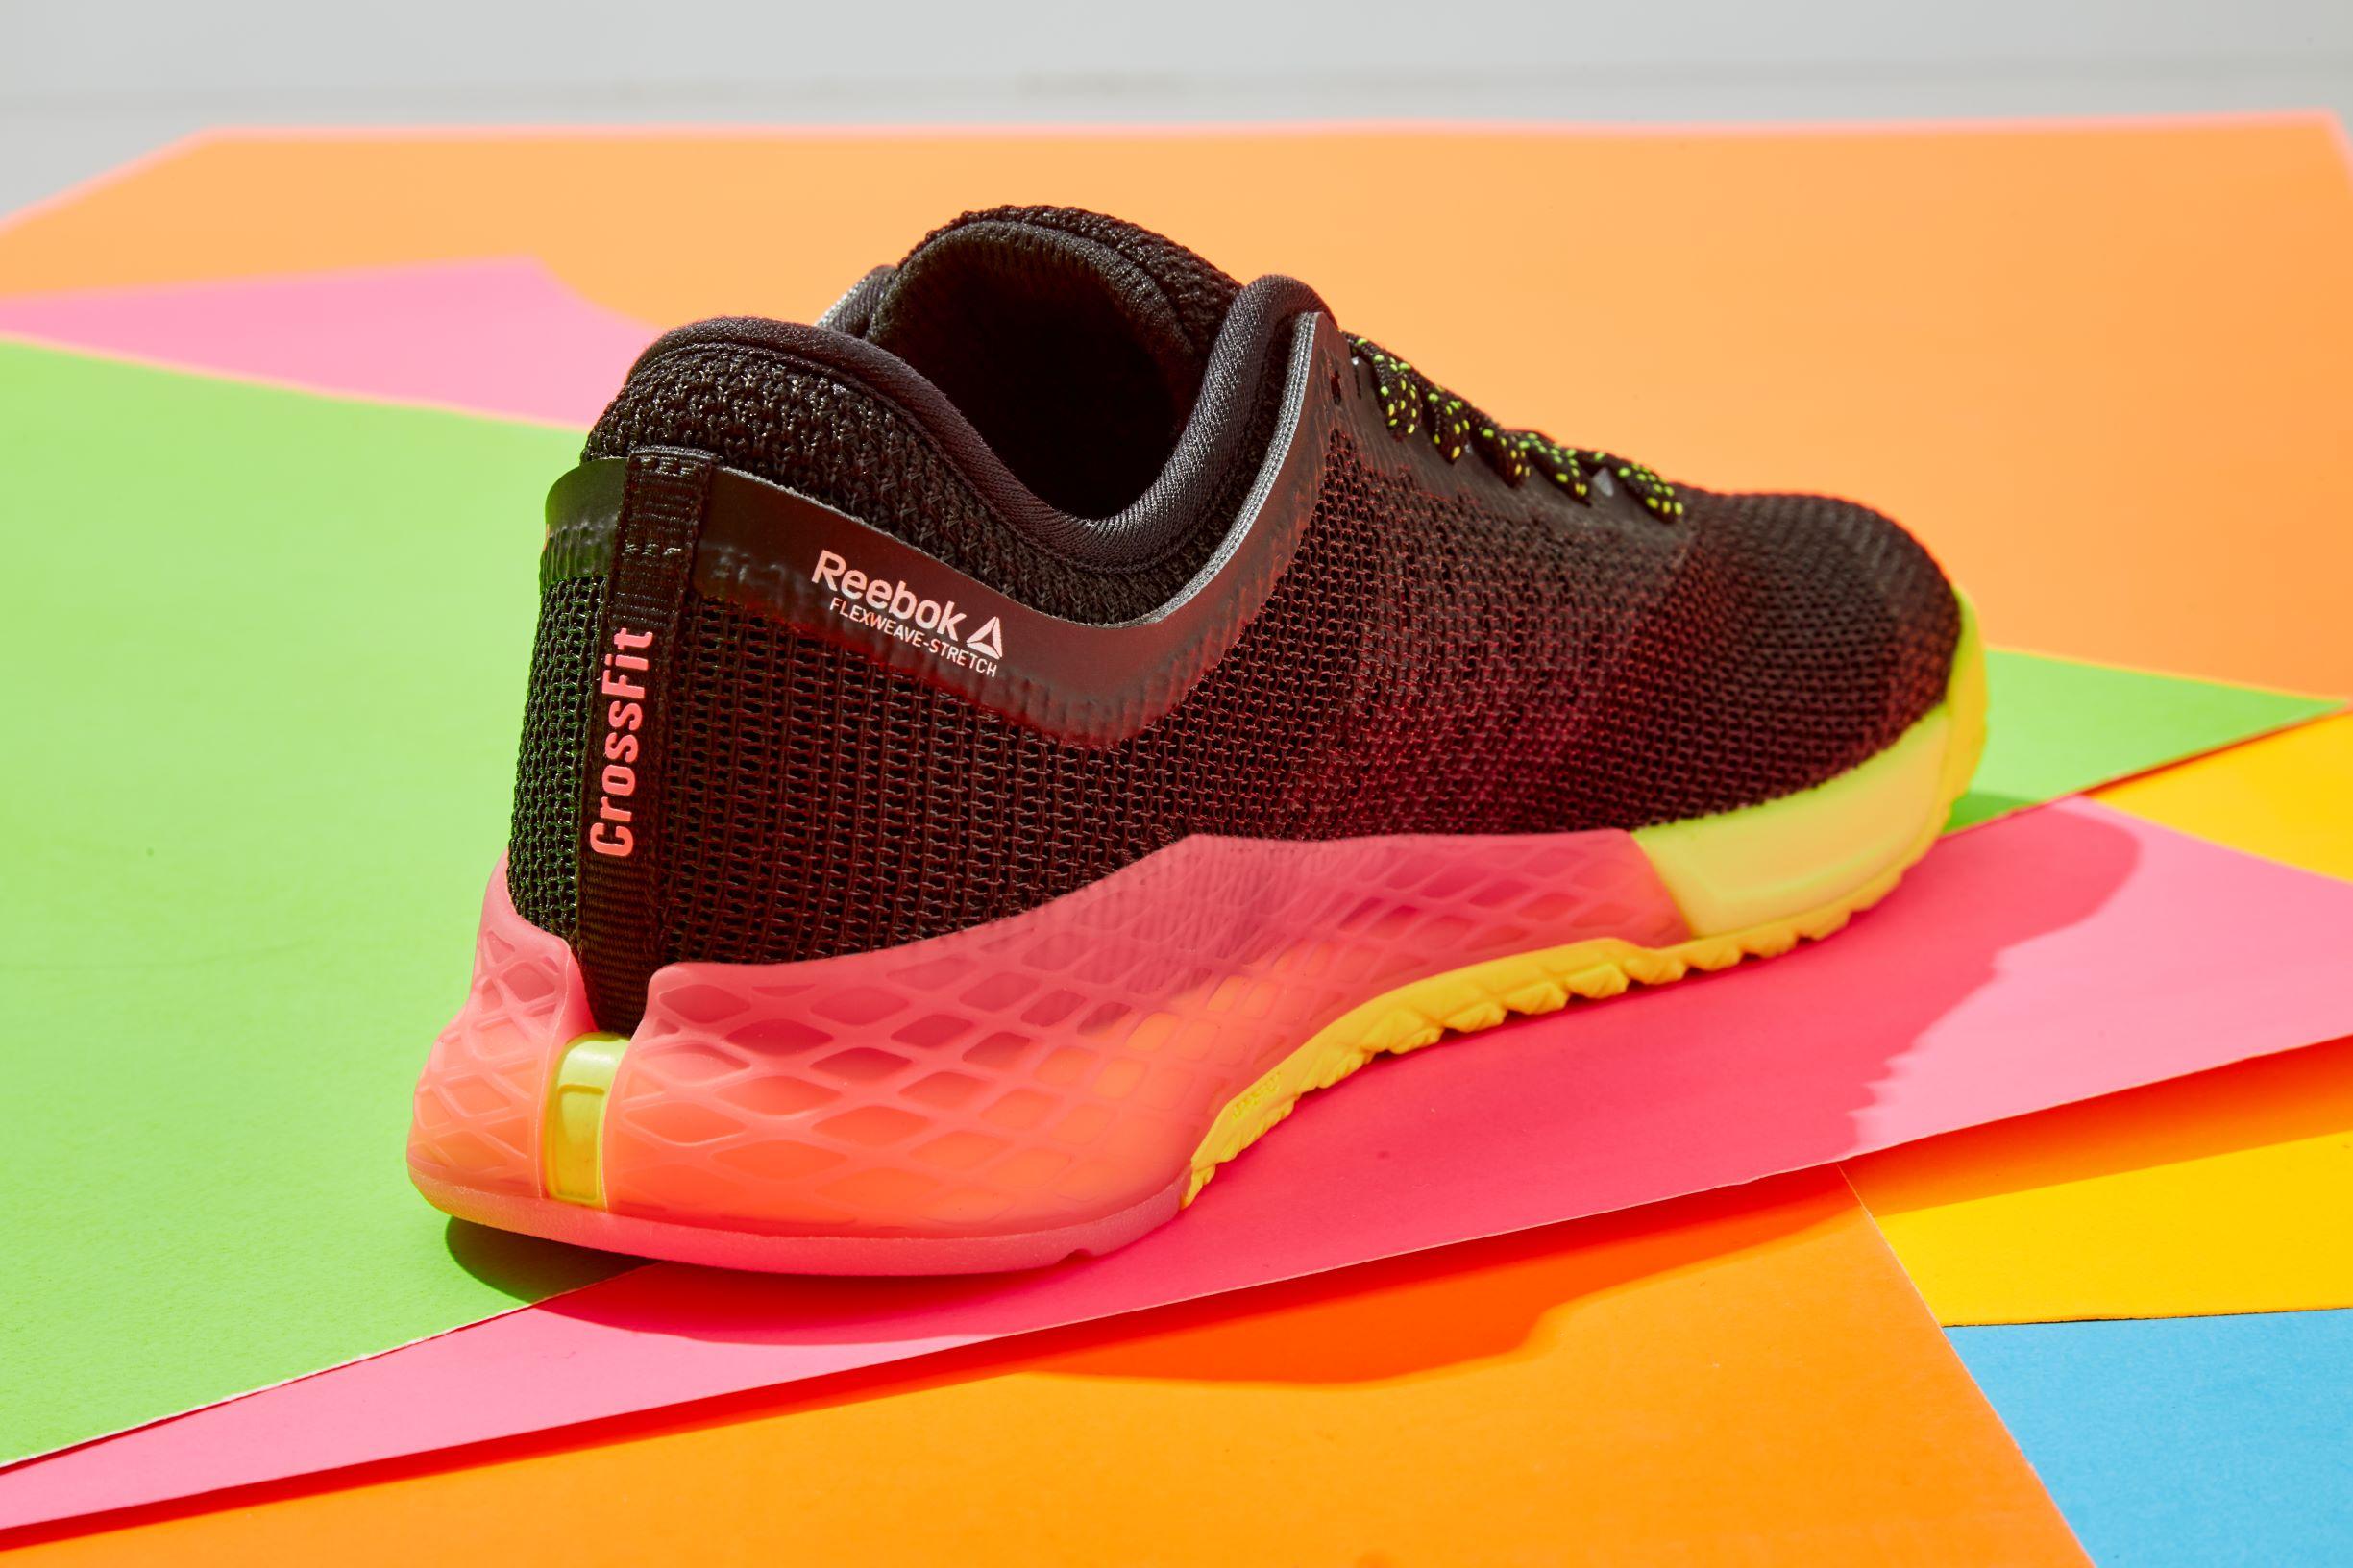 Step into a new sole: Reebok Nano 9